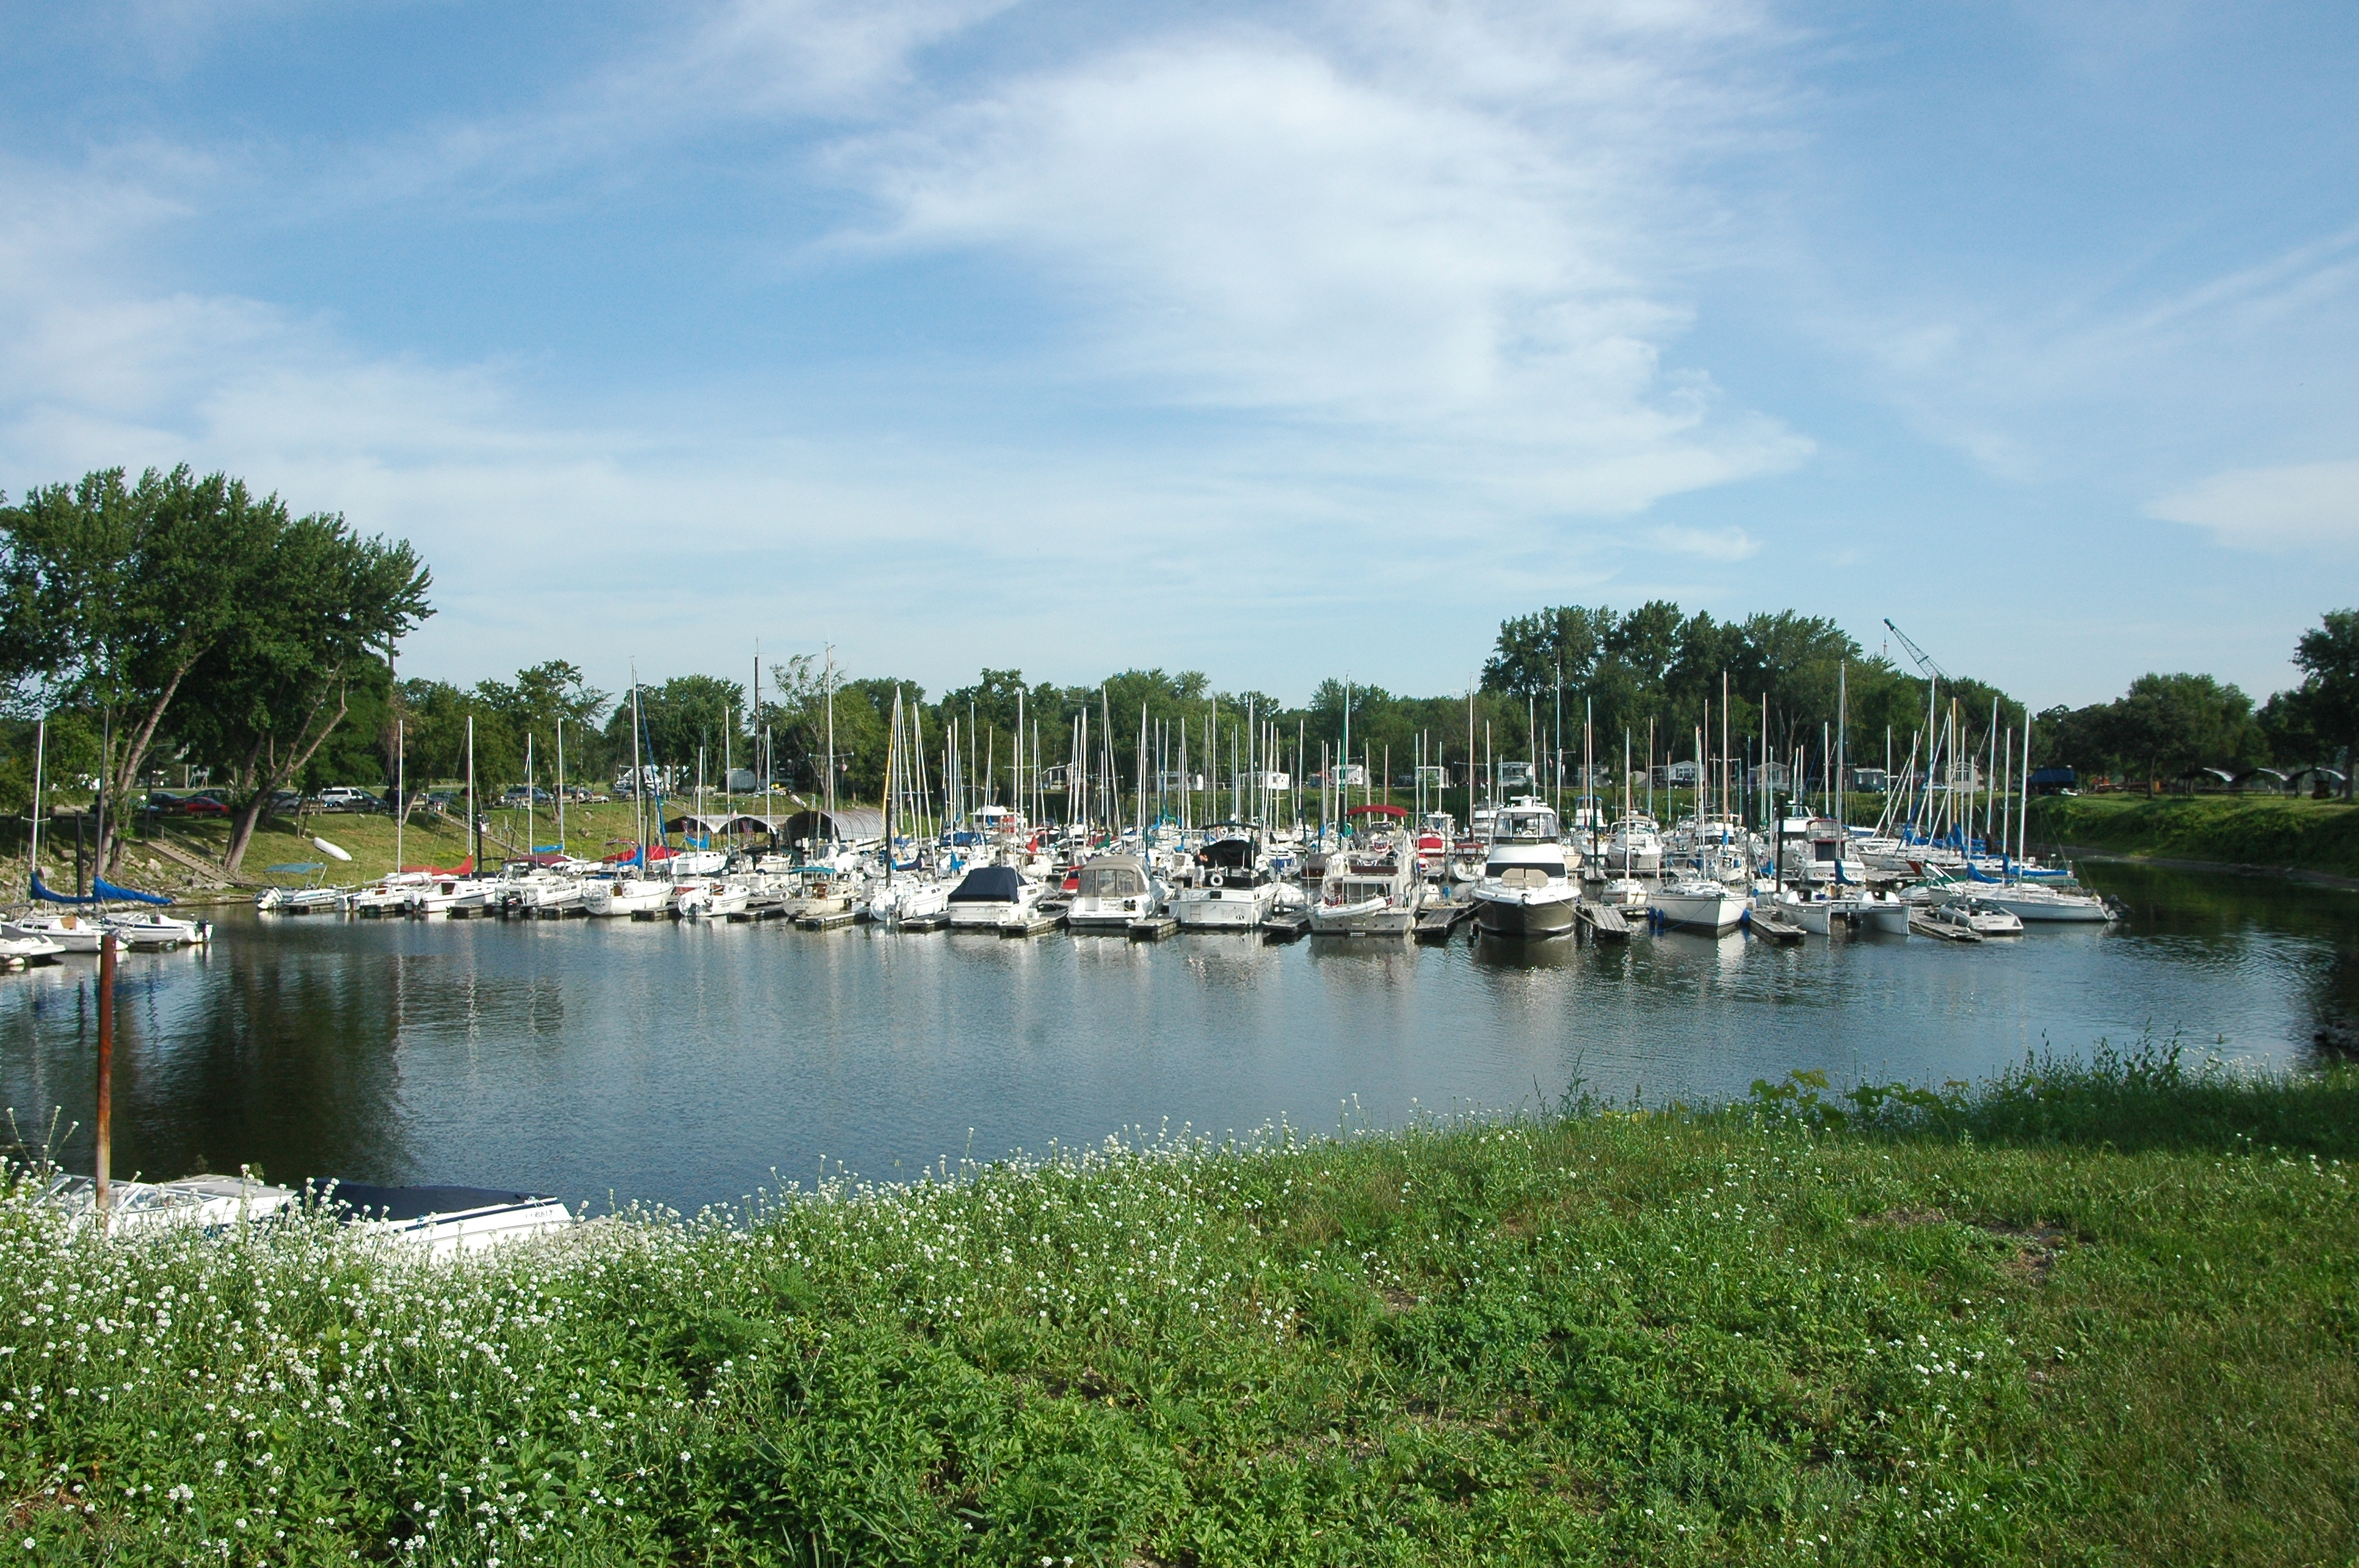 Hansen's Harbor